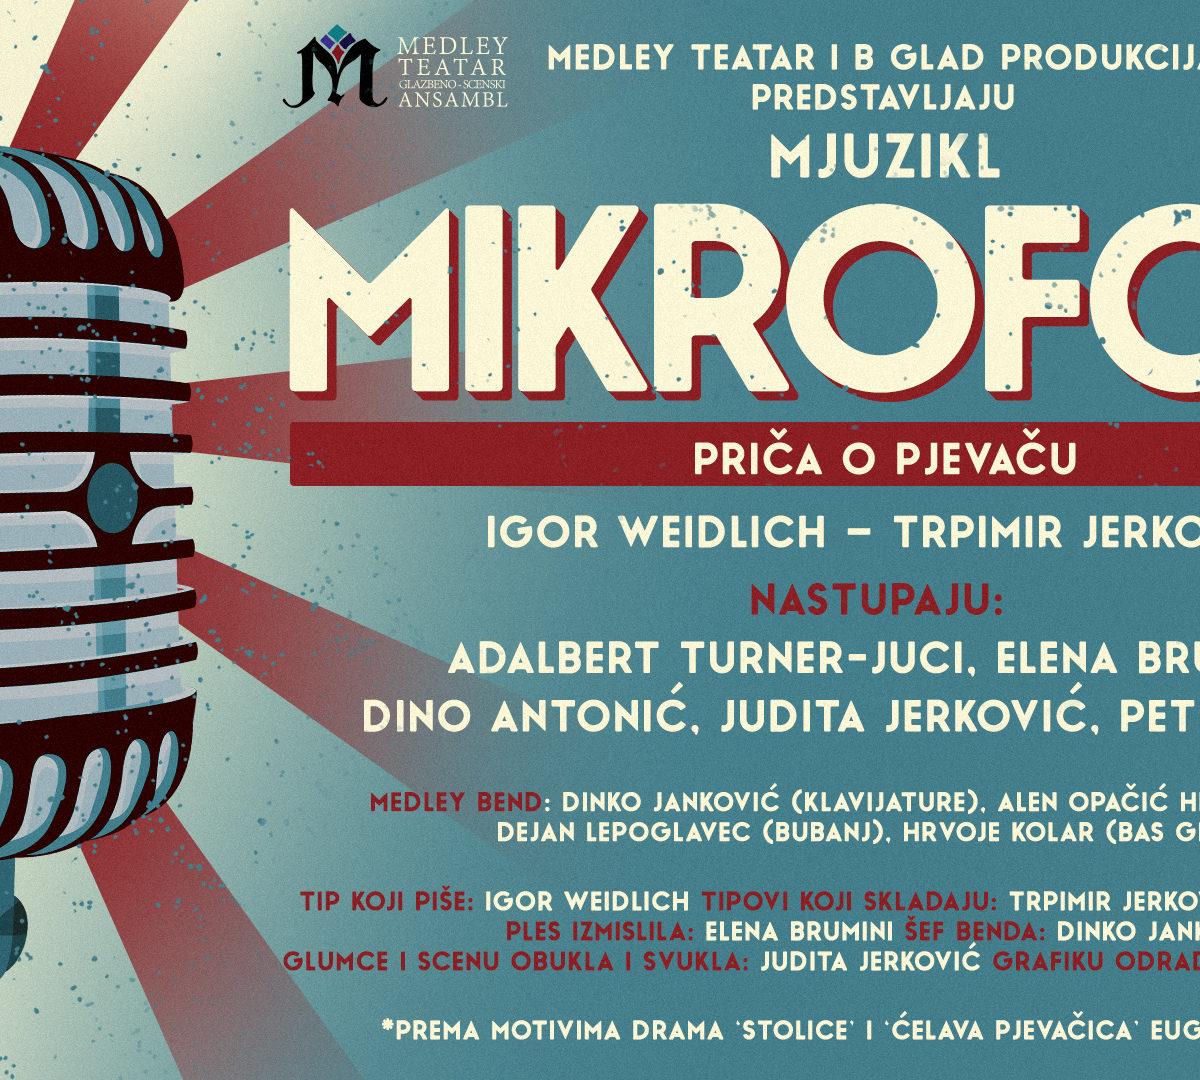 Mikrofoni. Novi mjuzikl Medley Teatra